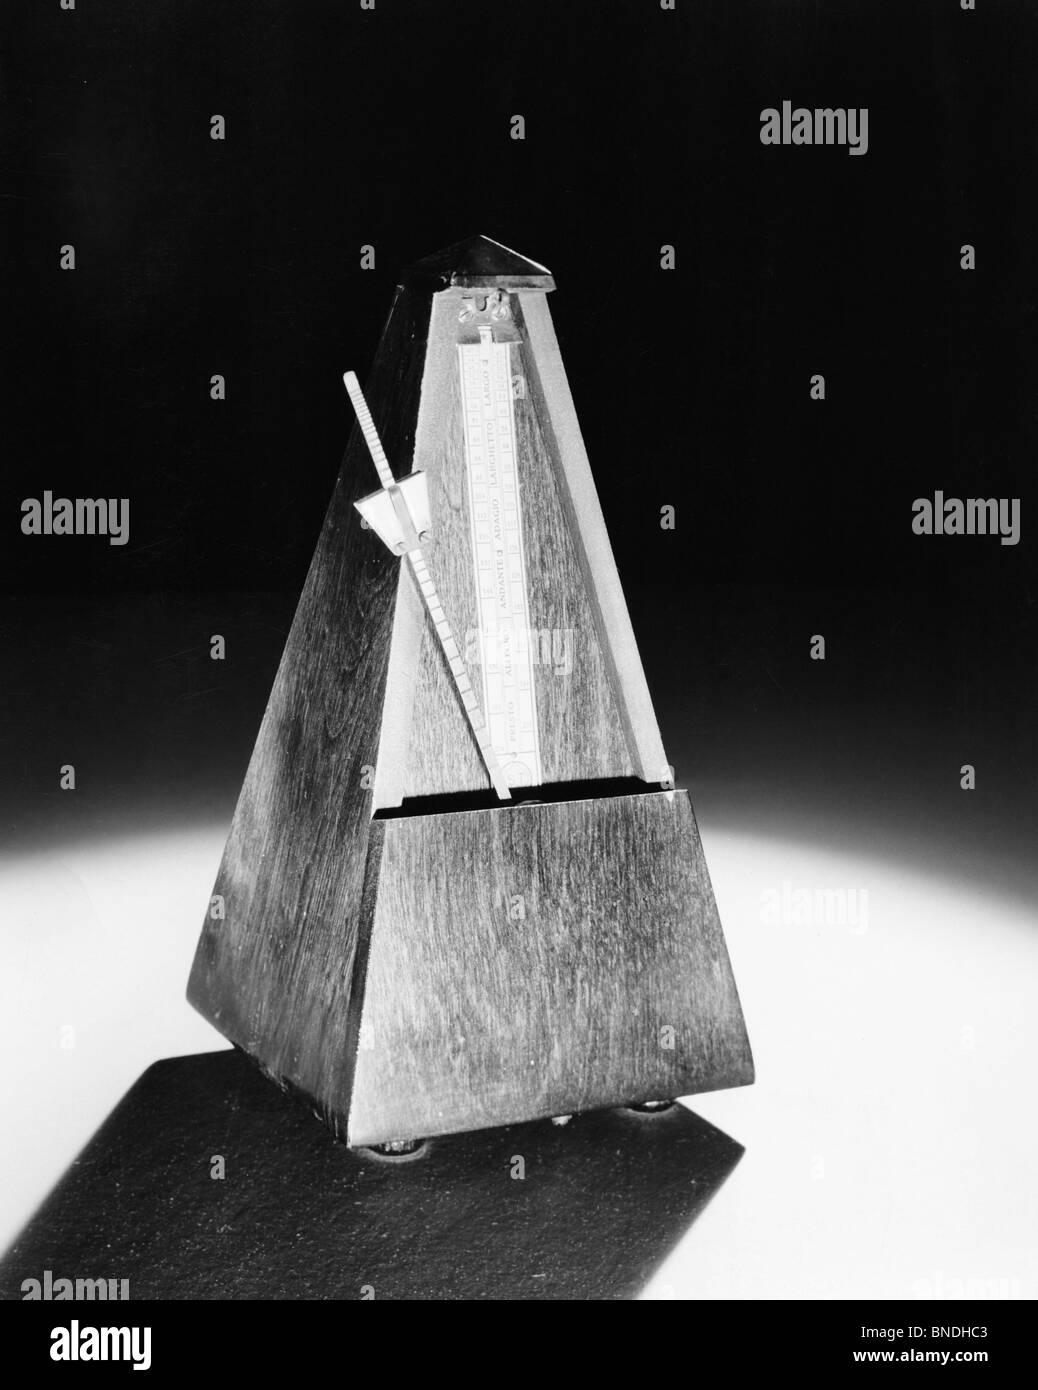 Close-up of a Metronome - Stock Image